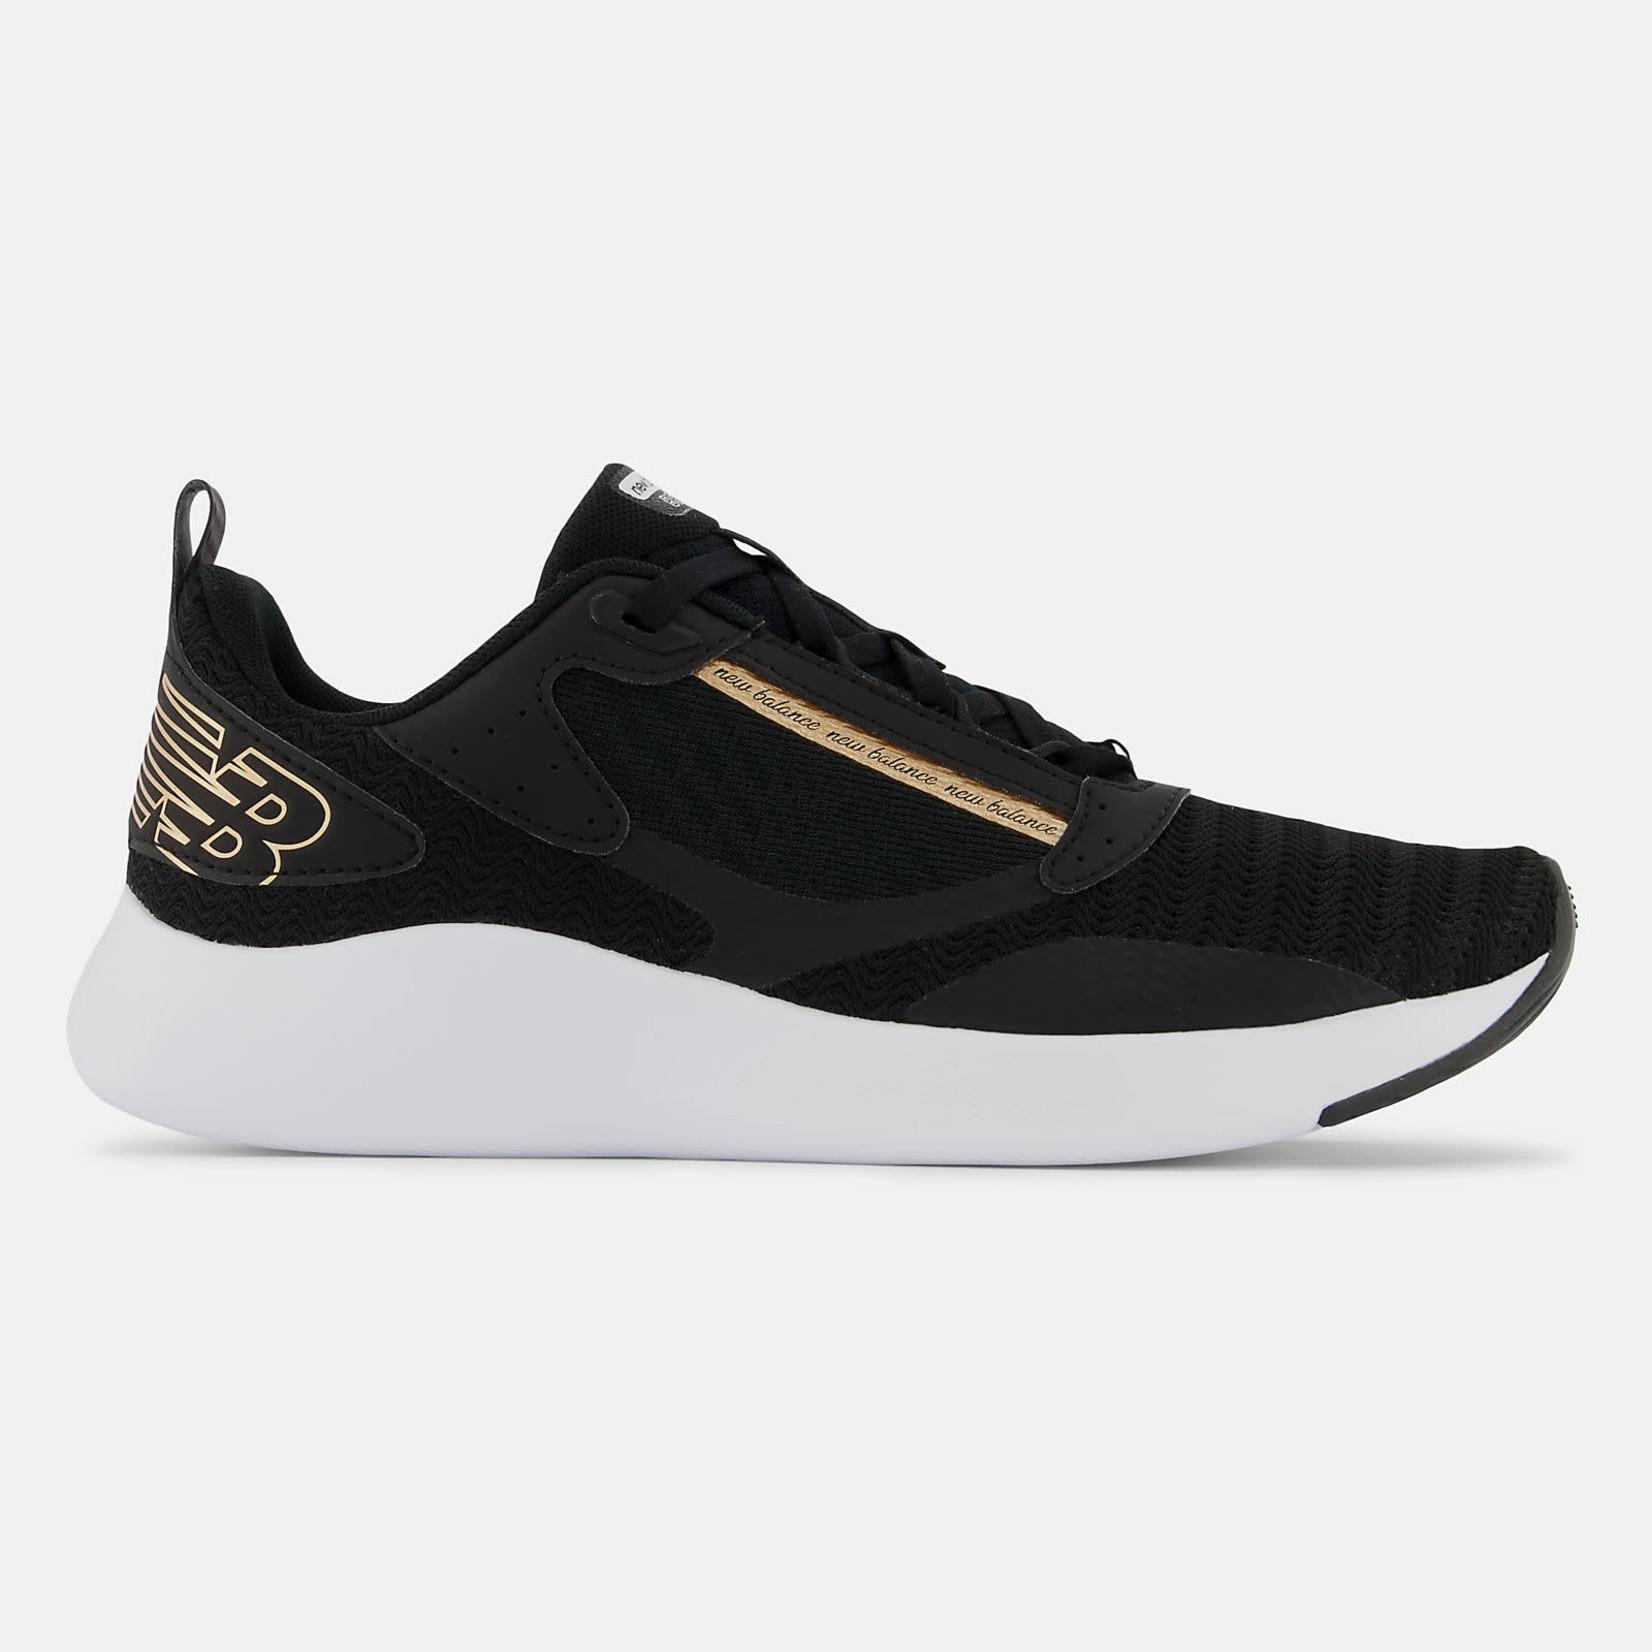 New Balance New Balance Casual Shoes, WBEYLB, Ladies